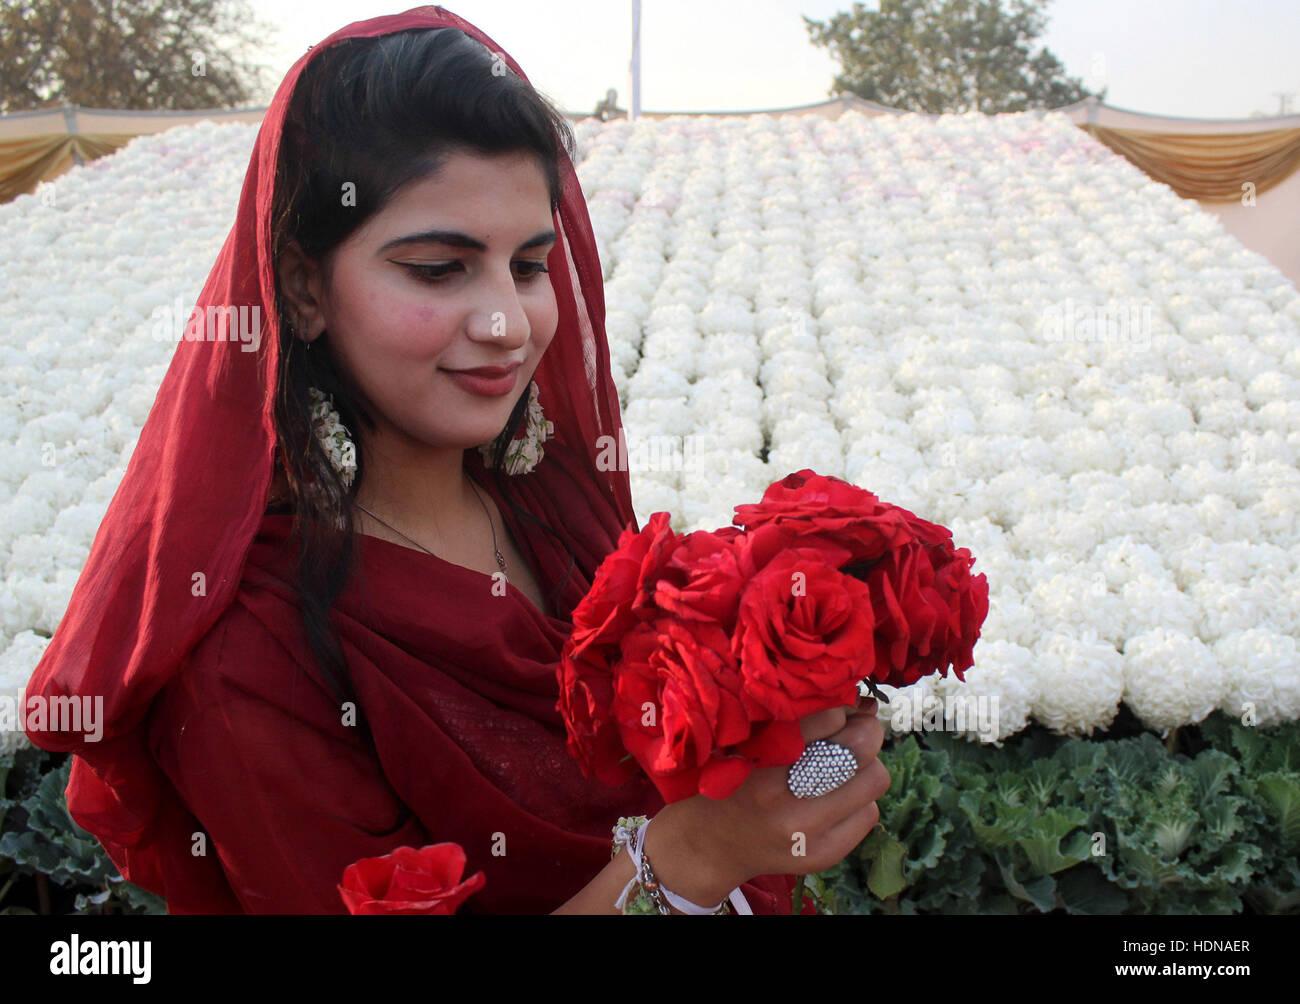 Beauty girl peshawar Hot Pakistani